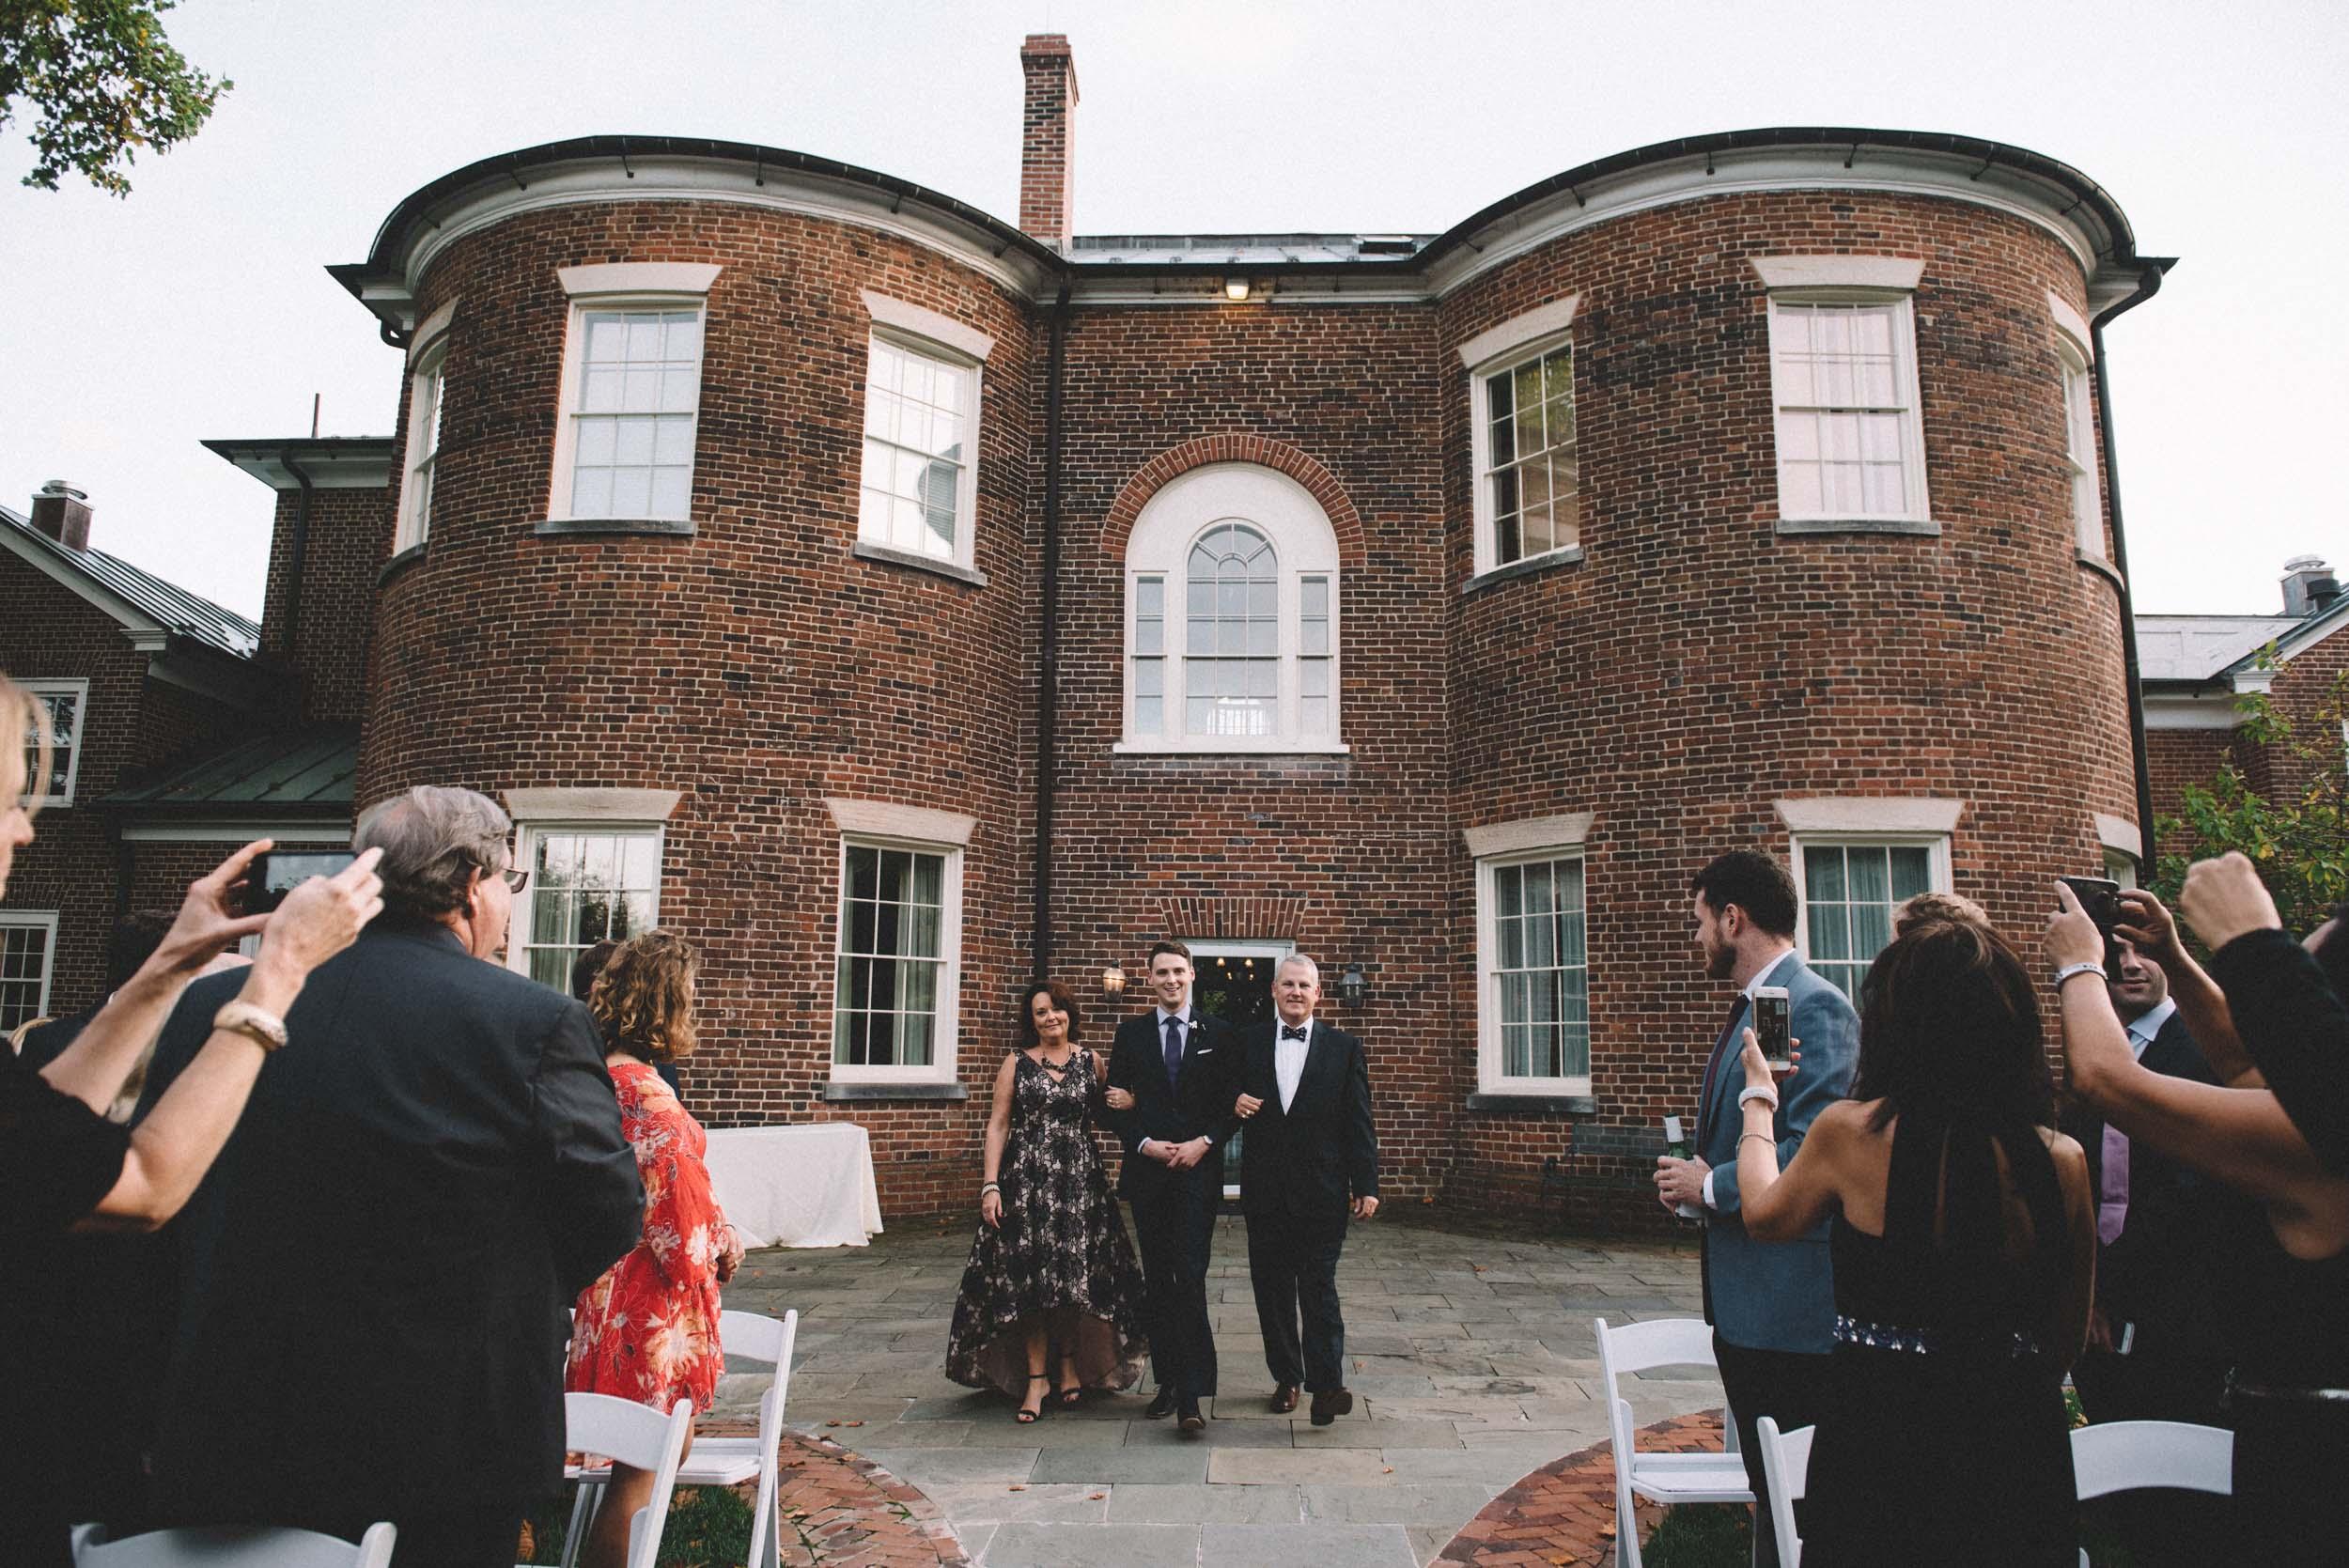 Dumbarton-House-wedding-36.jpg